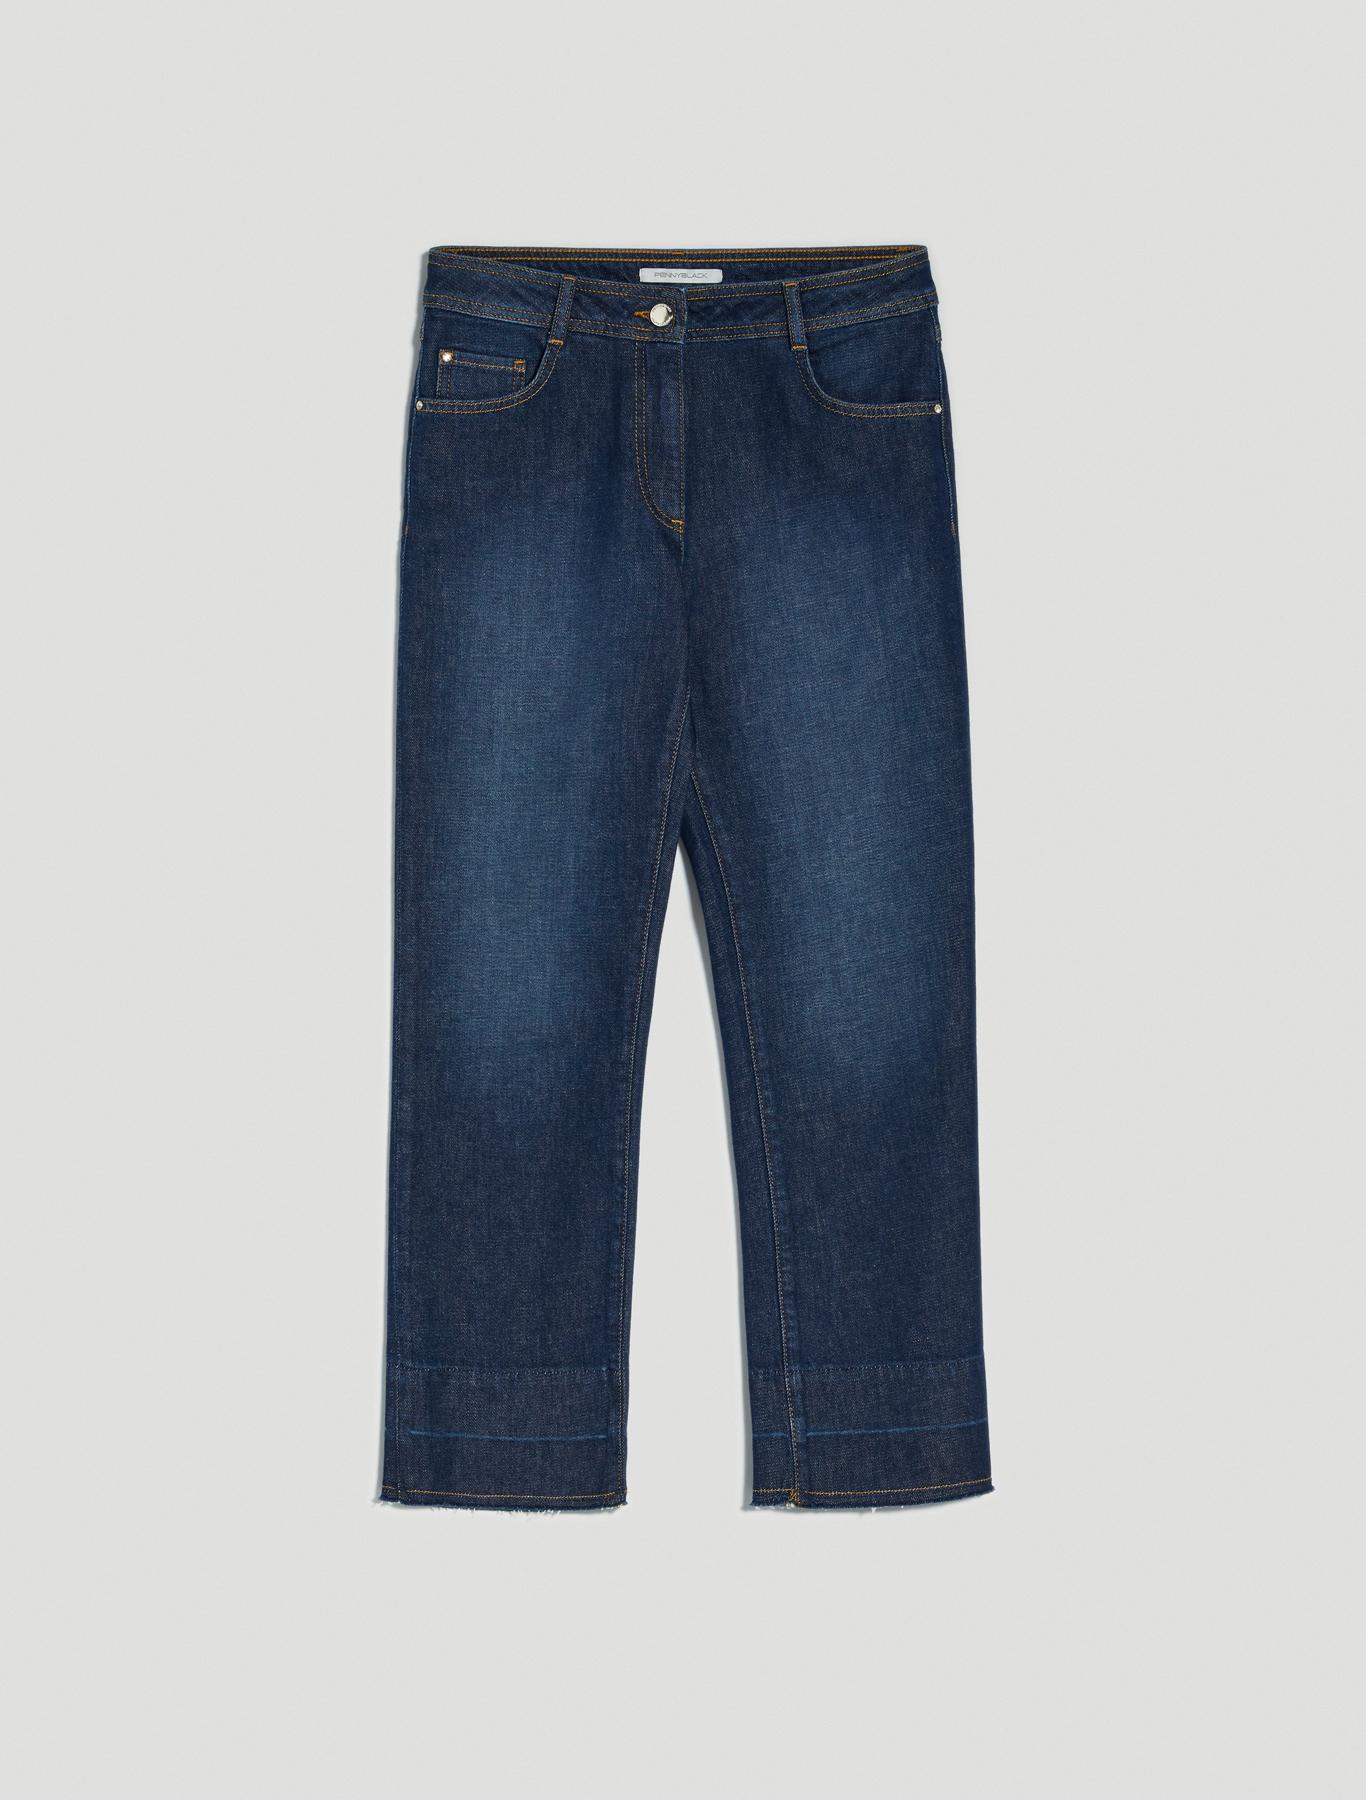 Kick-flare jeans - midnight blue - pennyblack